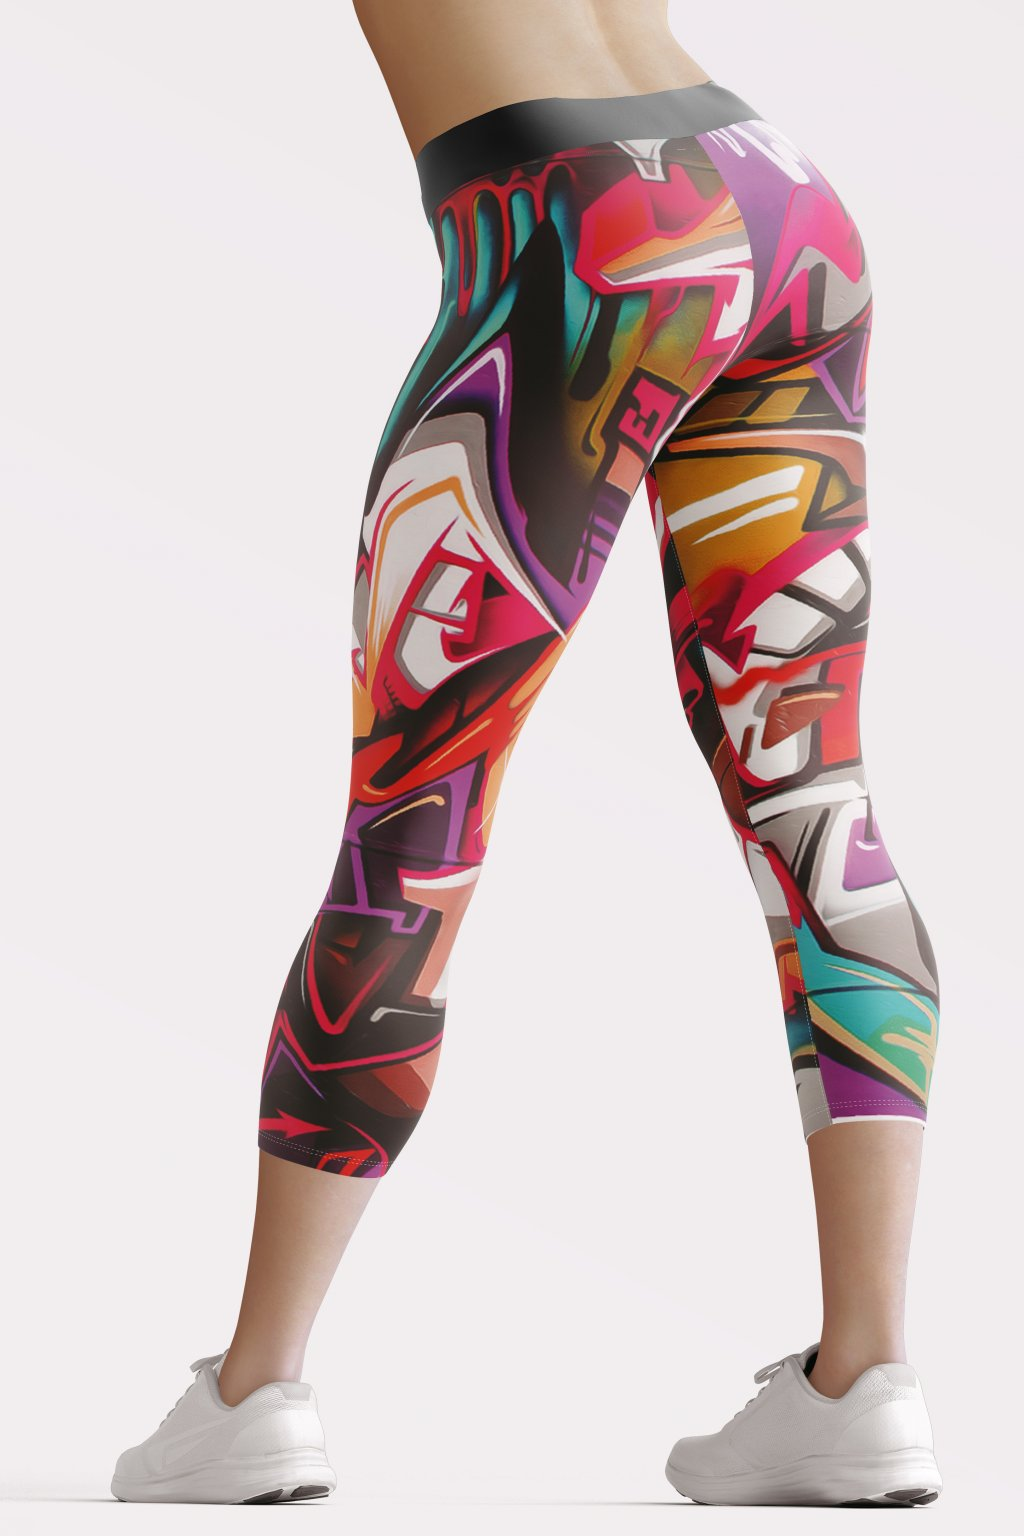 melbourne 3 4 leggings back by utopy